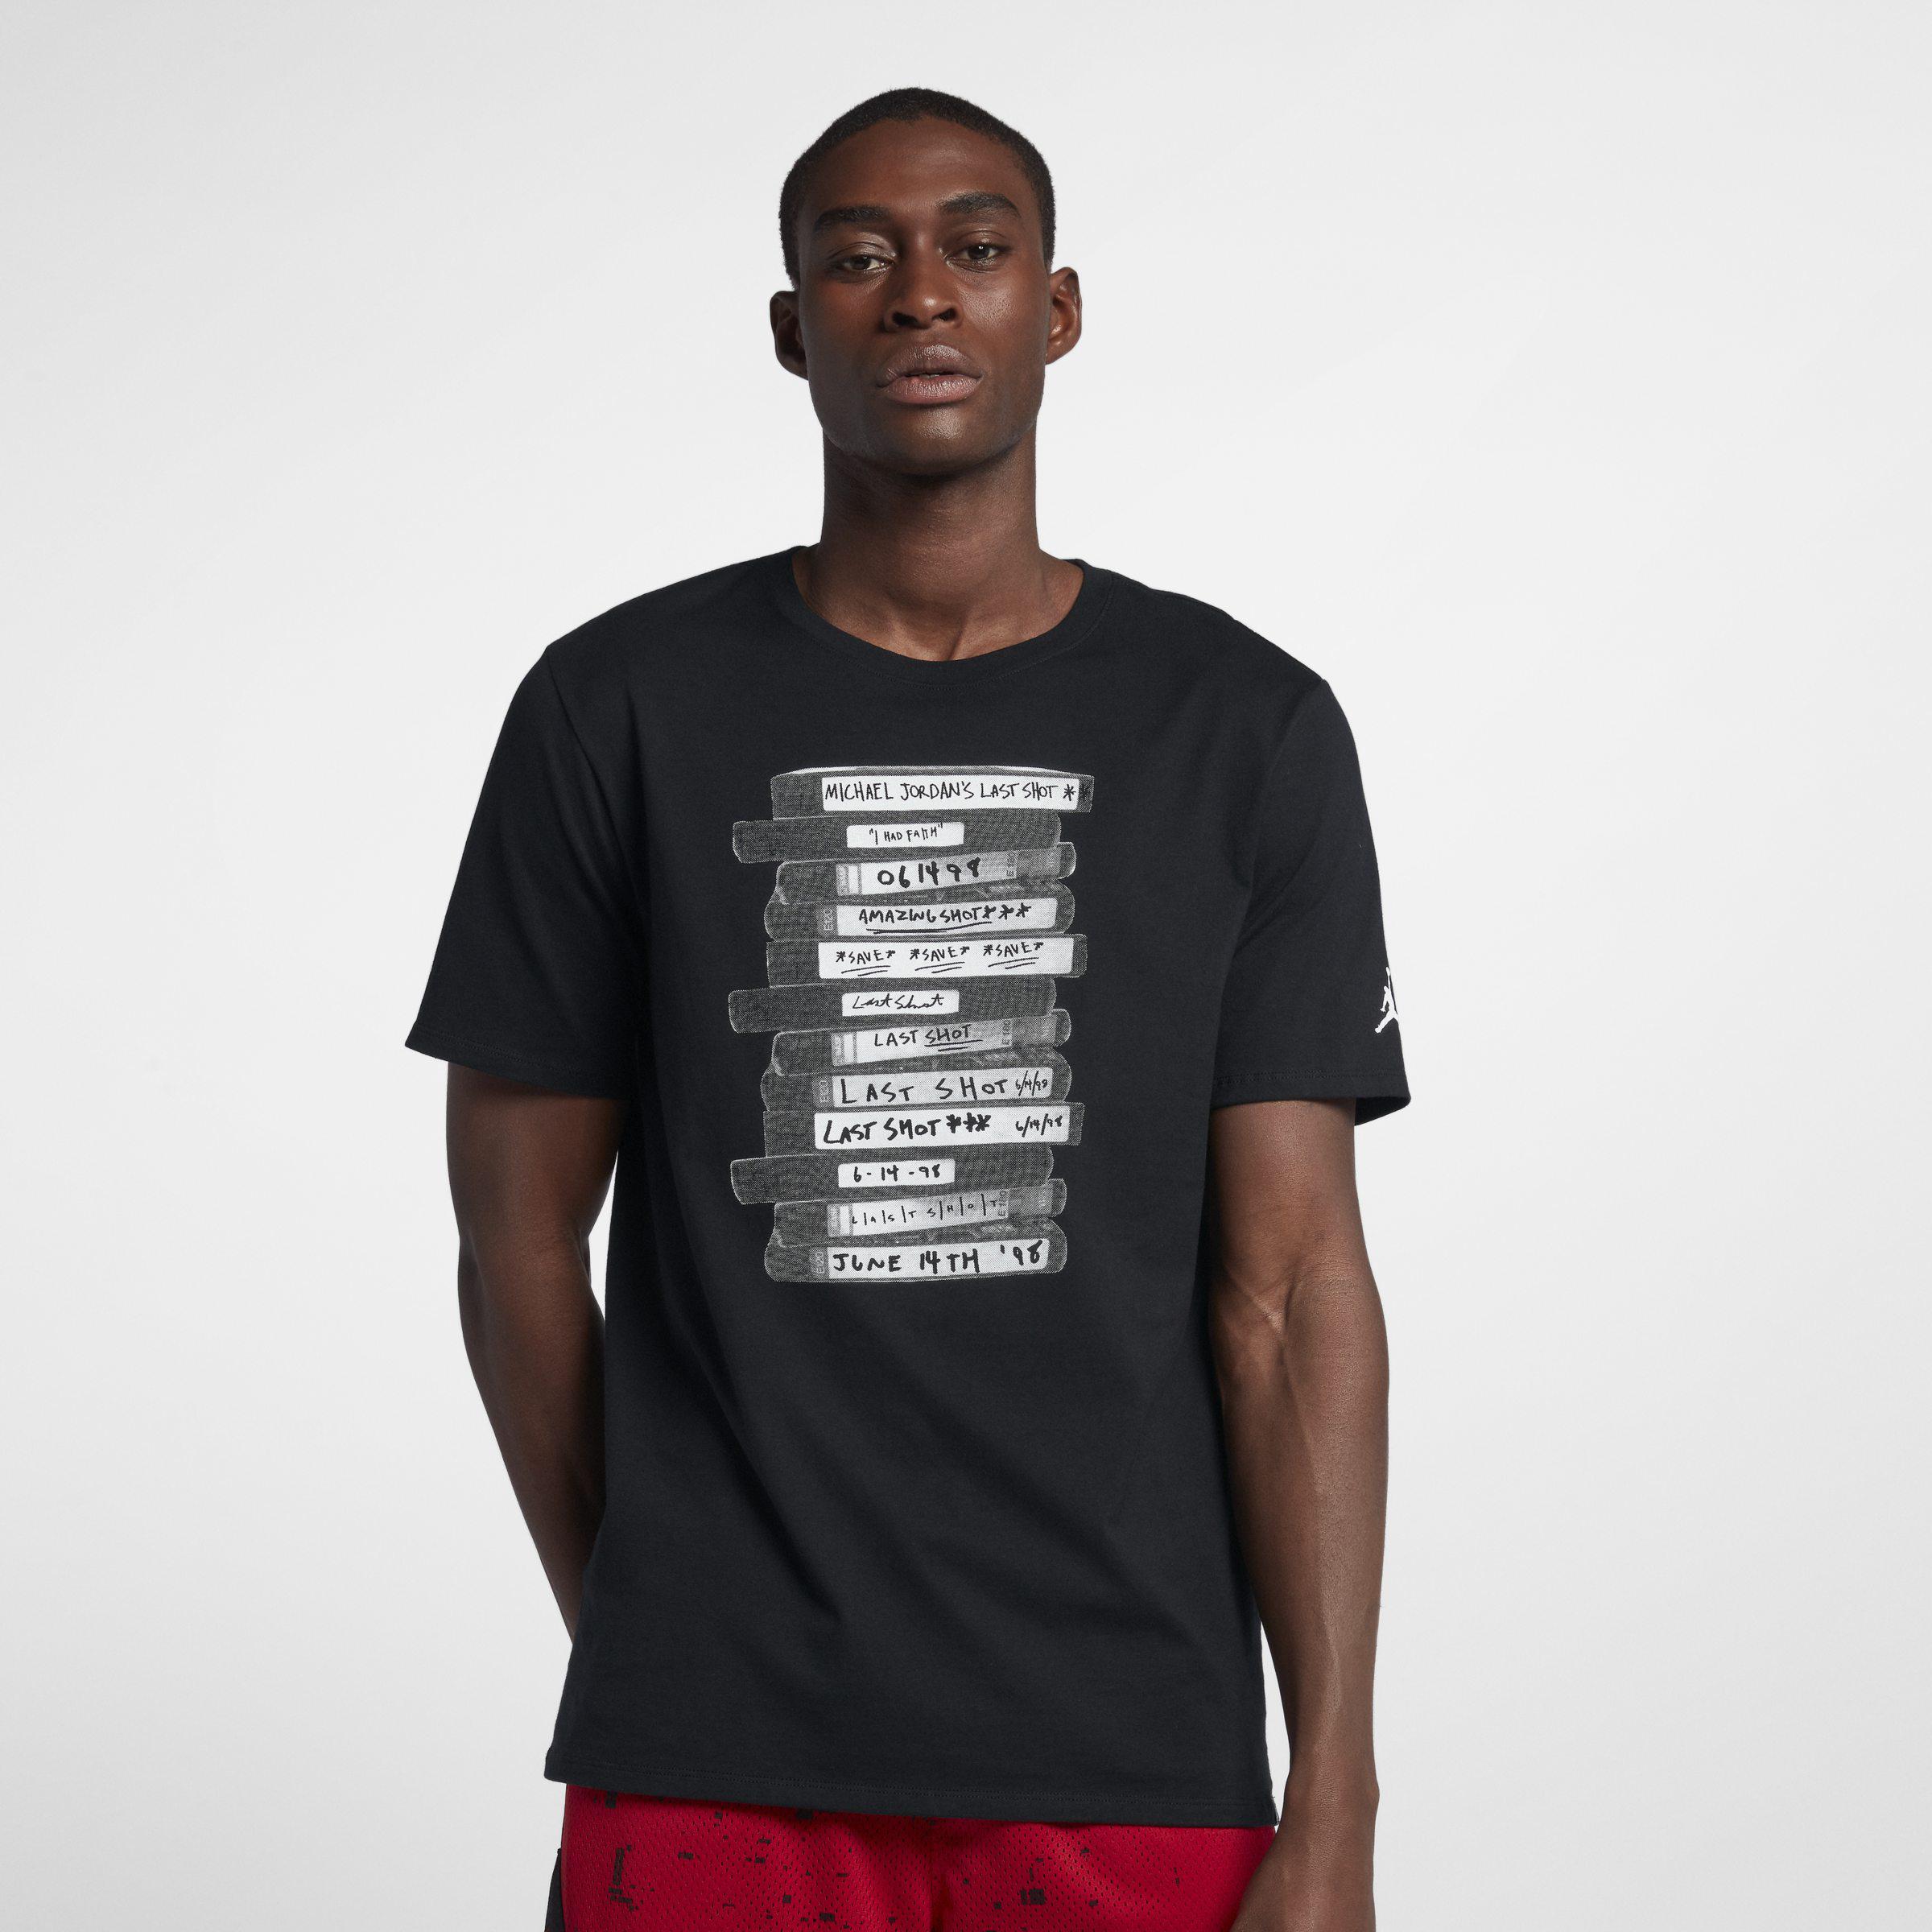 2413e5055a0171 Nike Jordan Lifestyle Last Shot T-shirt in Black for Men - Lyst